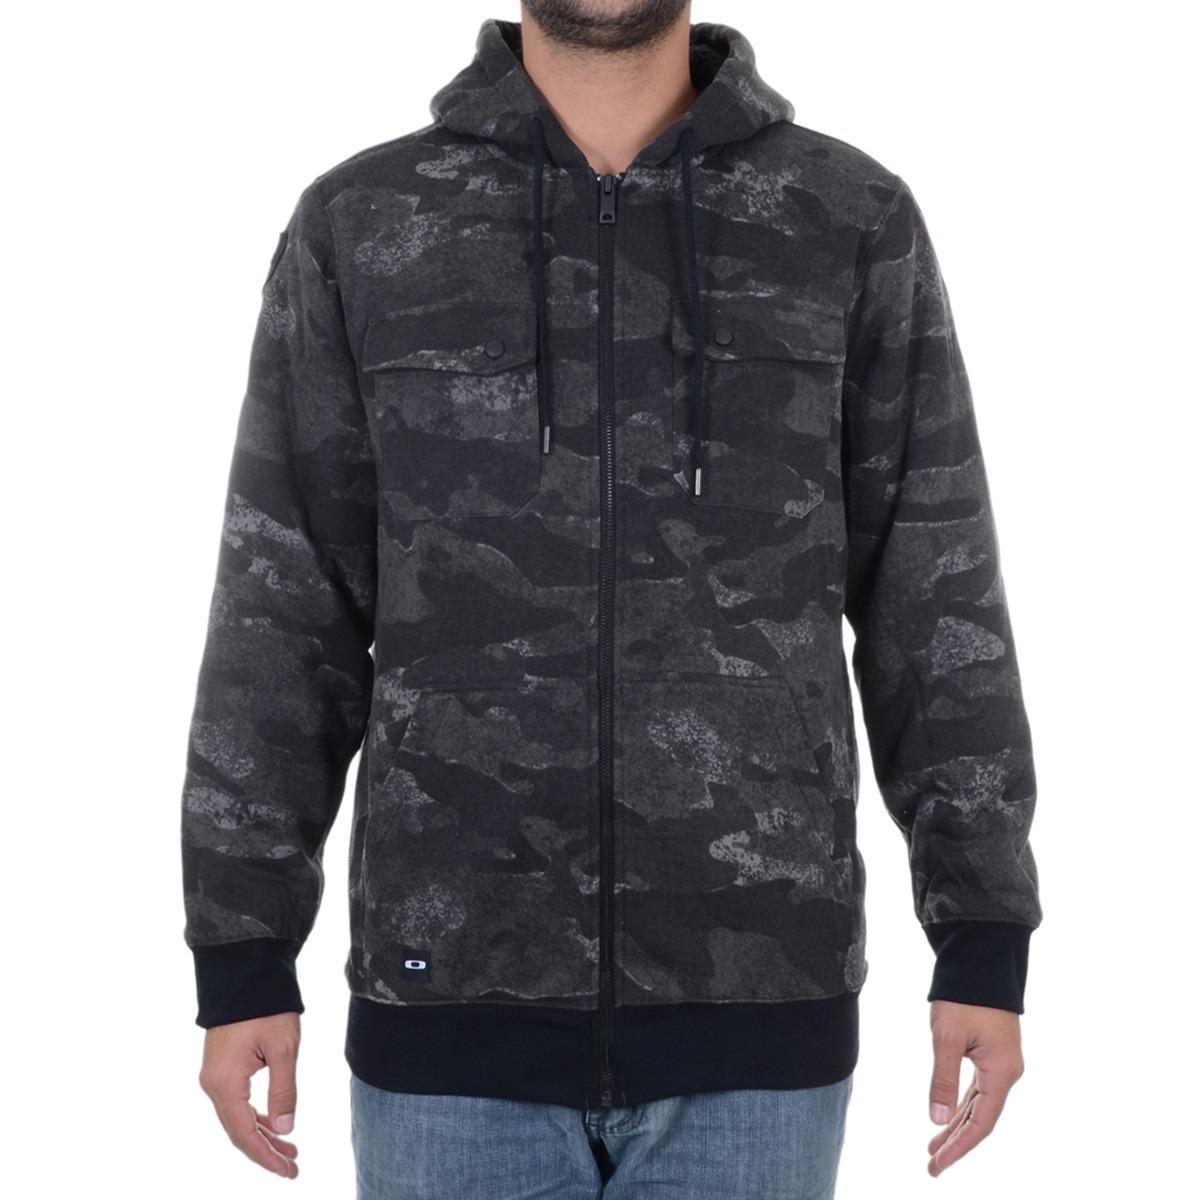 197b9c595c51c jaqueta masculina oakley agent hoodie. Carregando zoom.